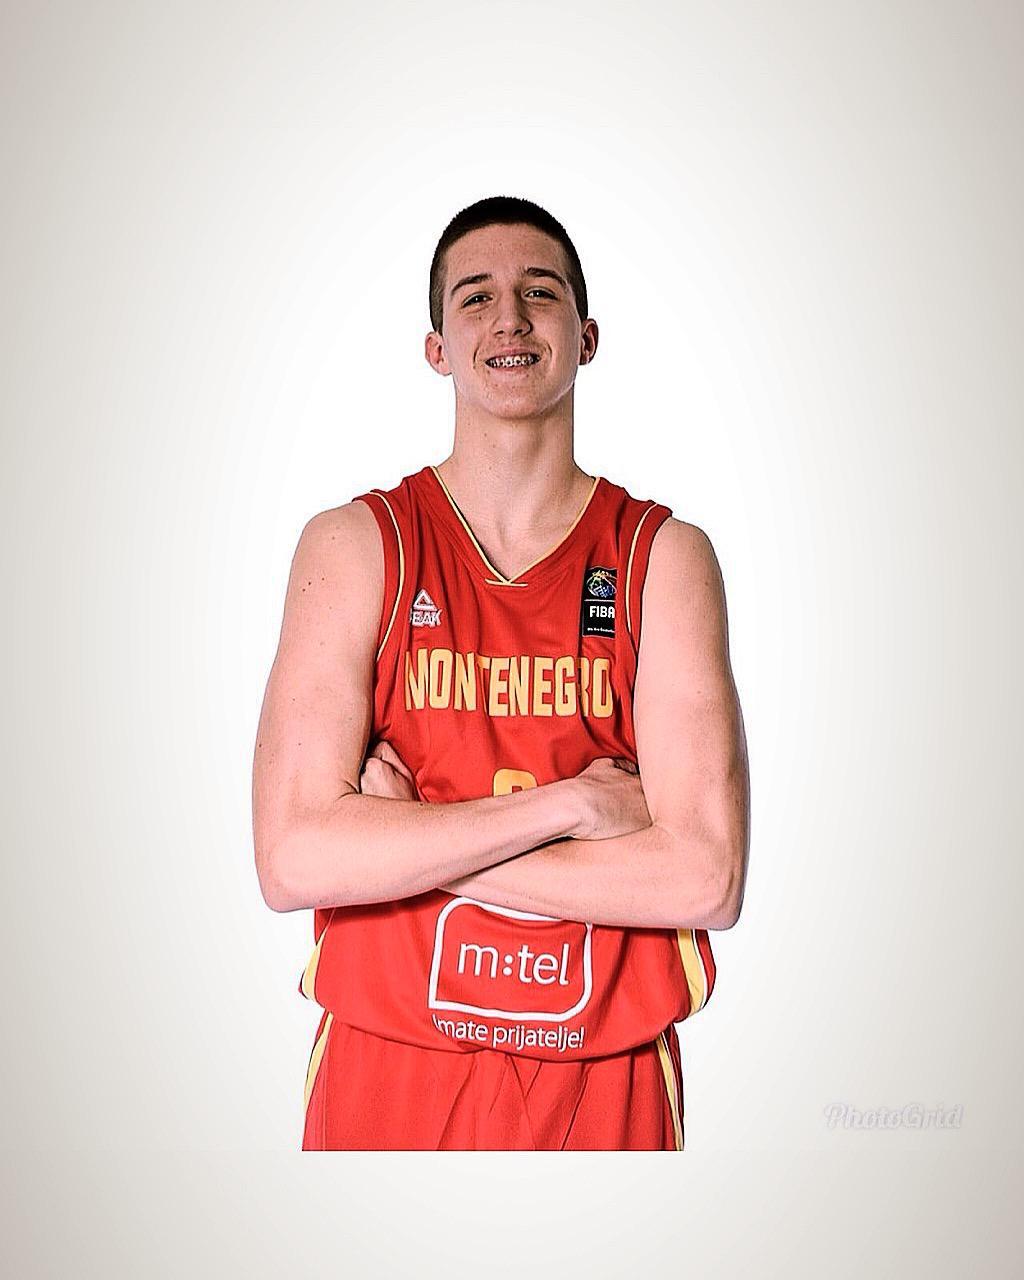 Il giovane talento montenegrino Okiljevic